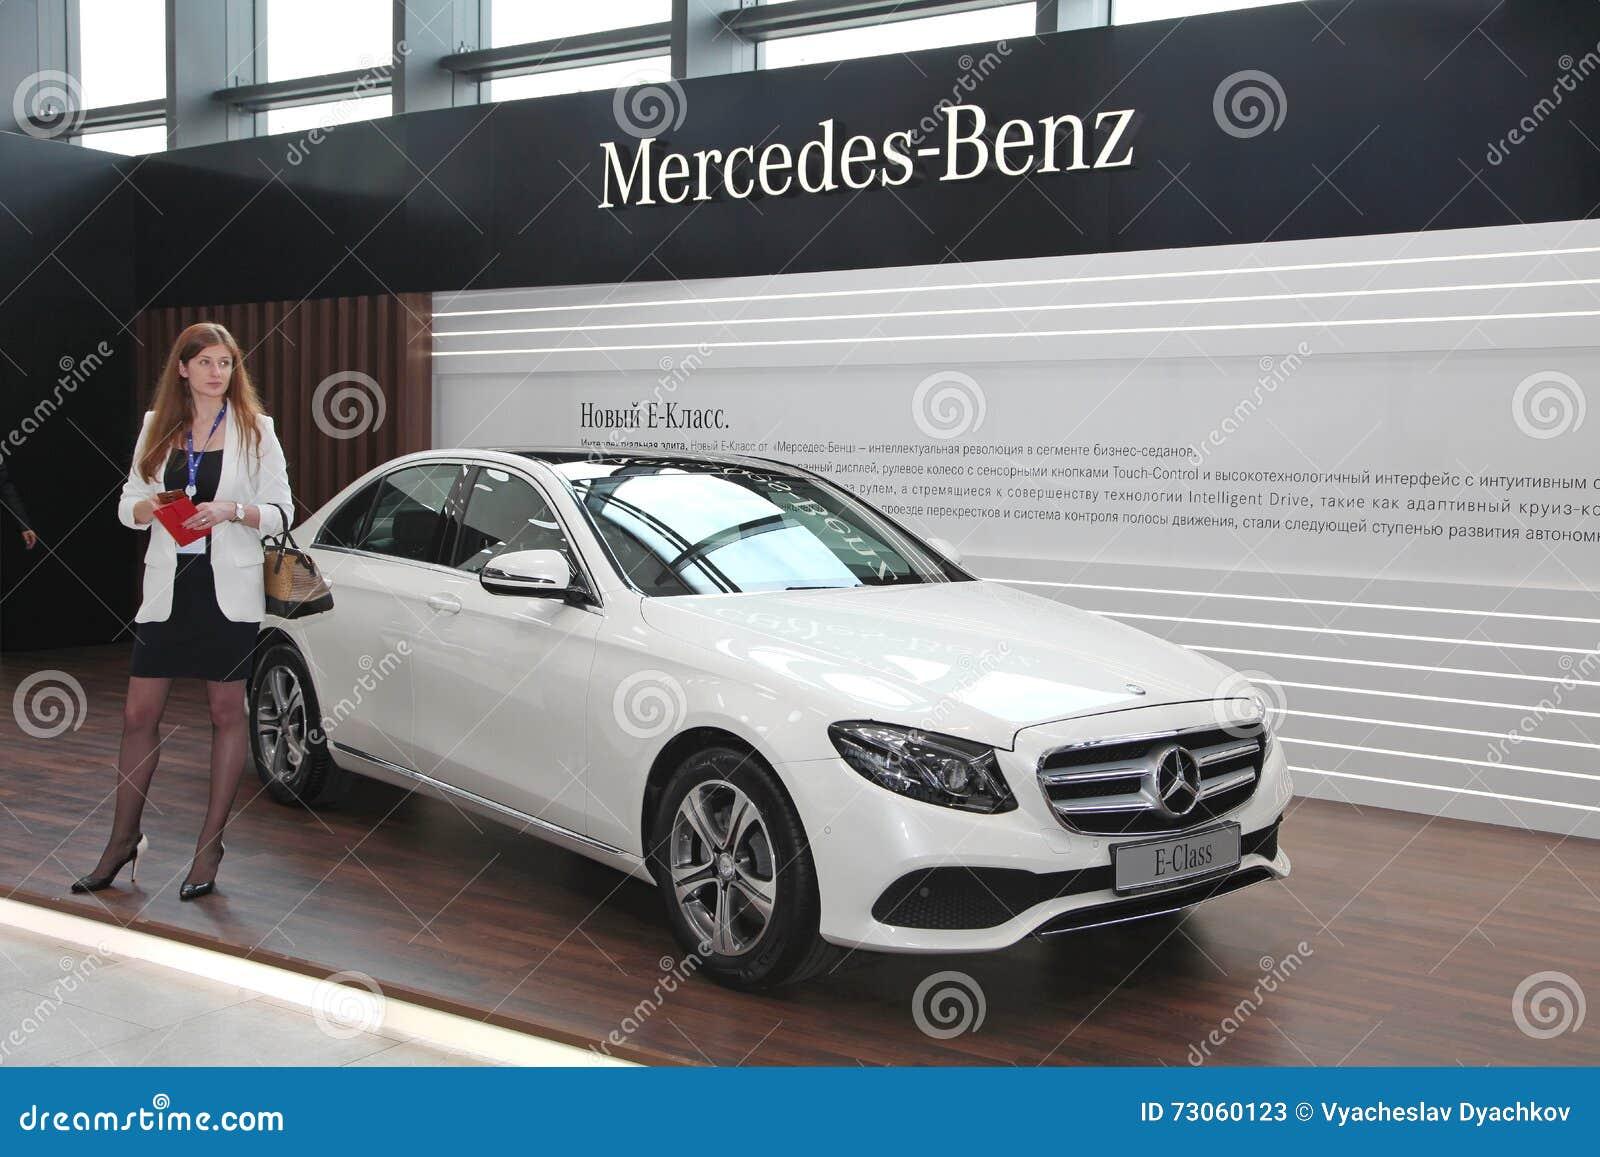 Xx saint petersburg international economic forum spief for Mercedes benz st petersburg